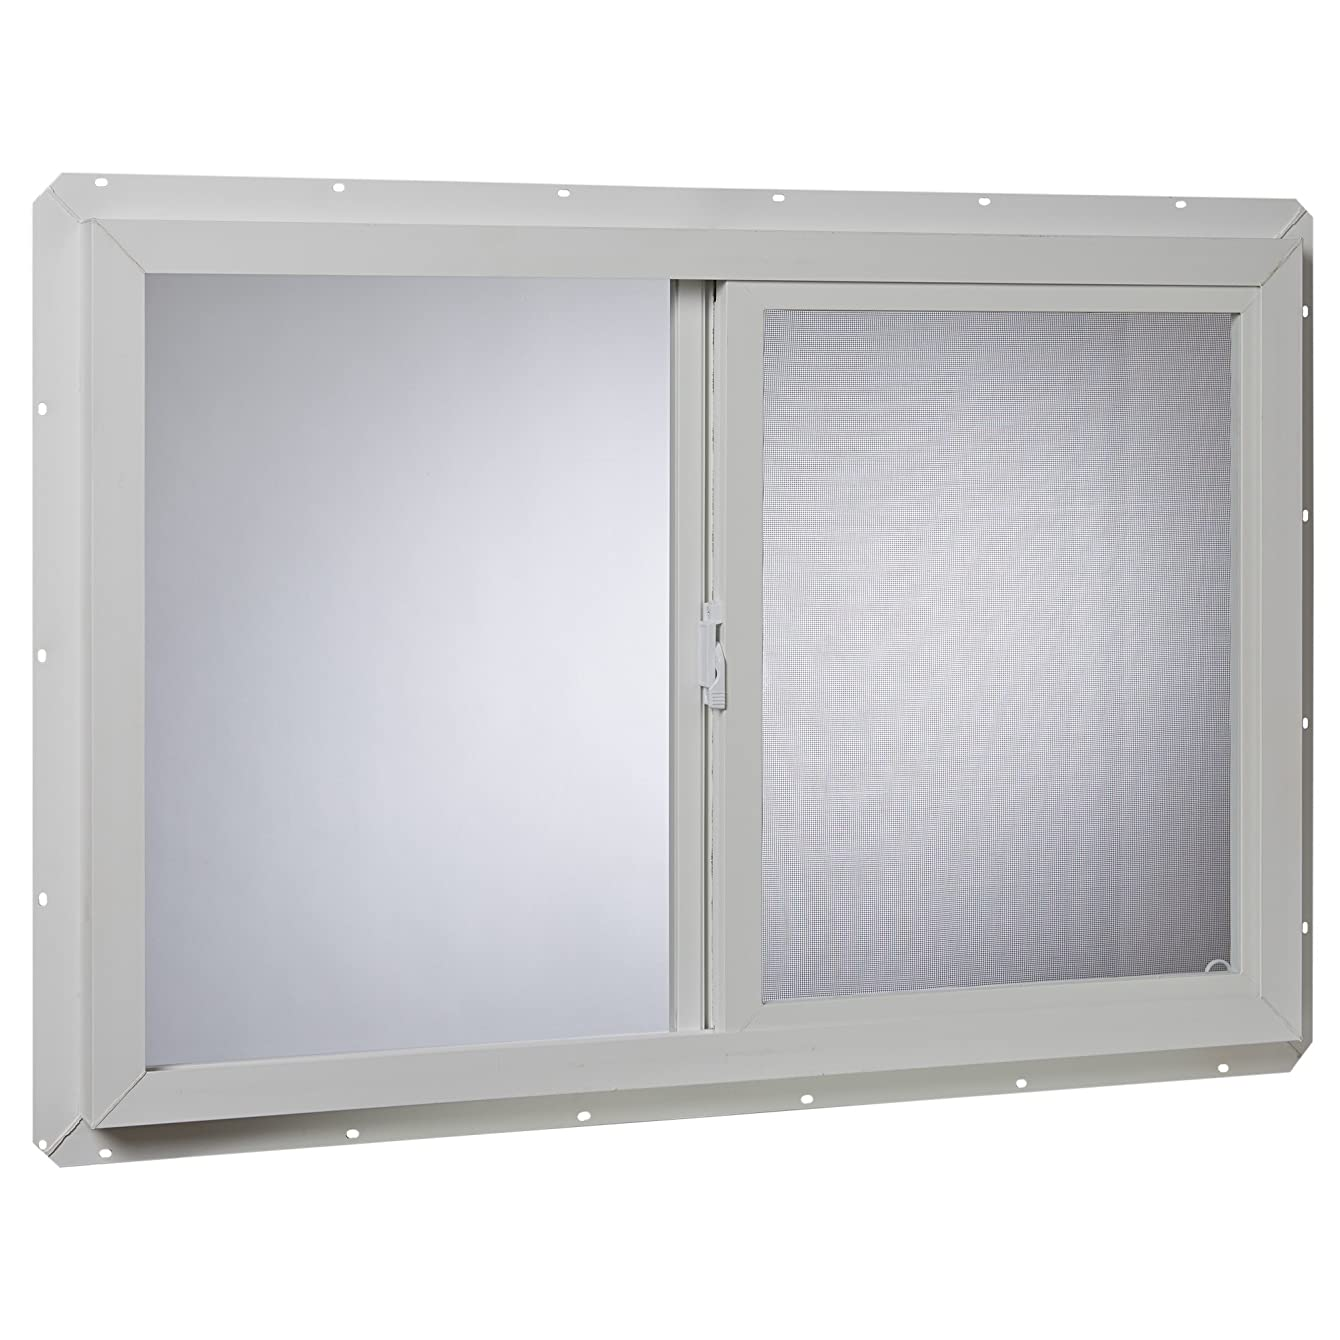 Park Ridge Products VUS3624PR Park Ridge Slider Glazed 36 in. x 24 in. Utility Single-Glass Sliding Vinyl Window – White, xkiehalyqzaav04